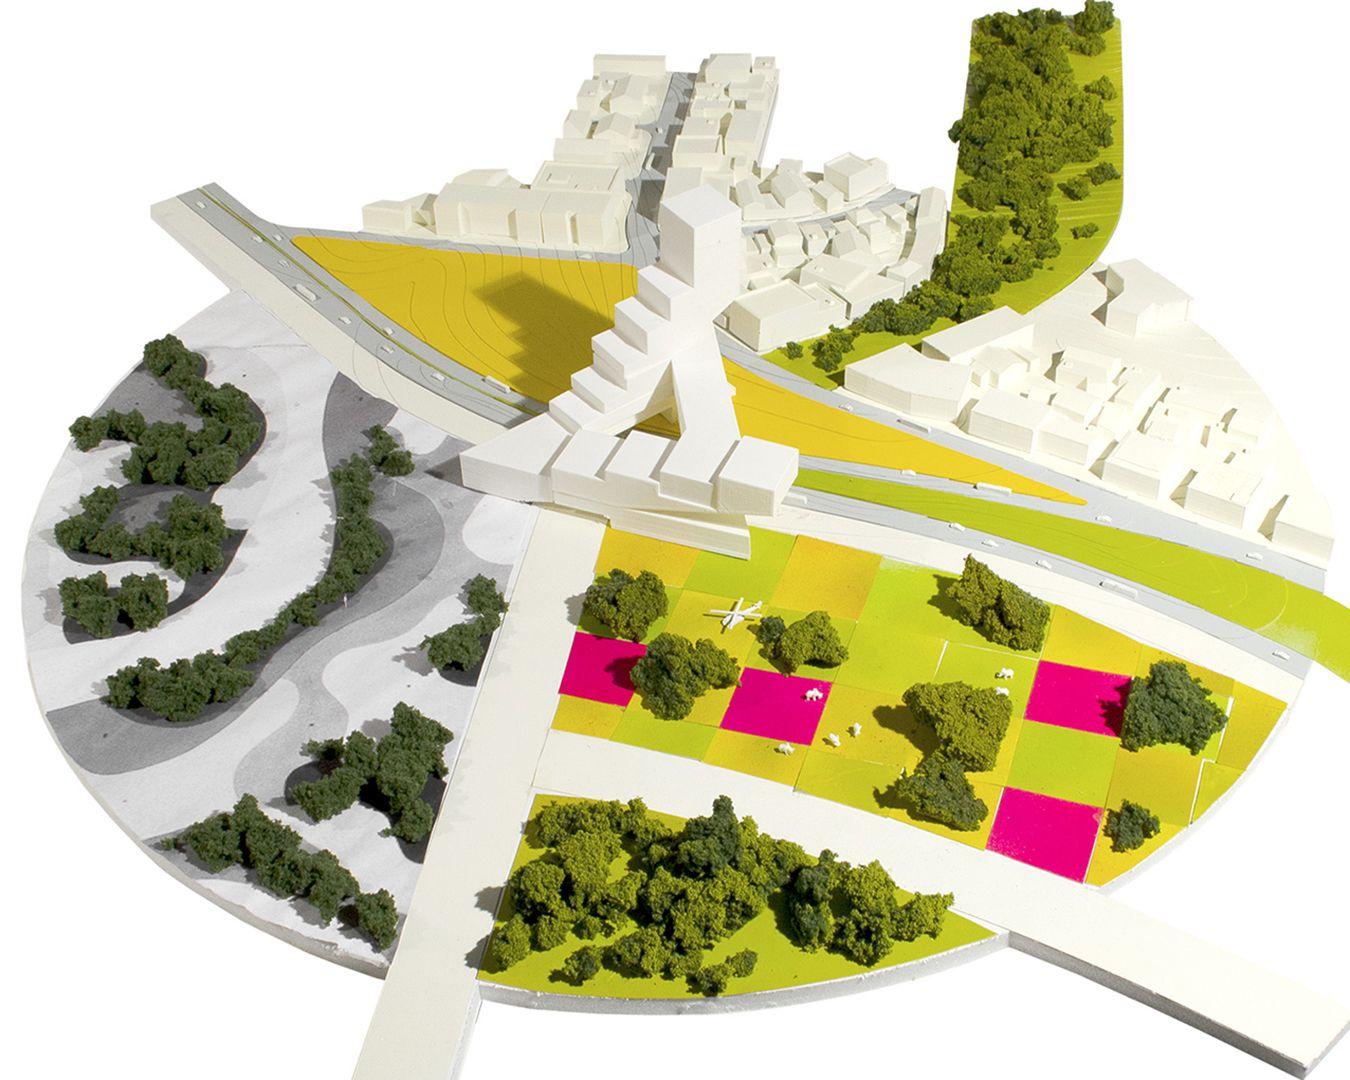 FOCO archive: GABON Ministry of Parks site model #Africa #Gabon #Libreville #architecture #urbanism #foco